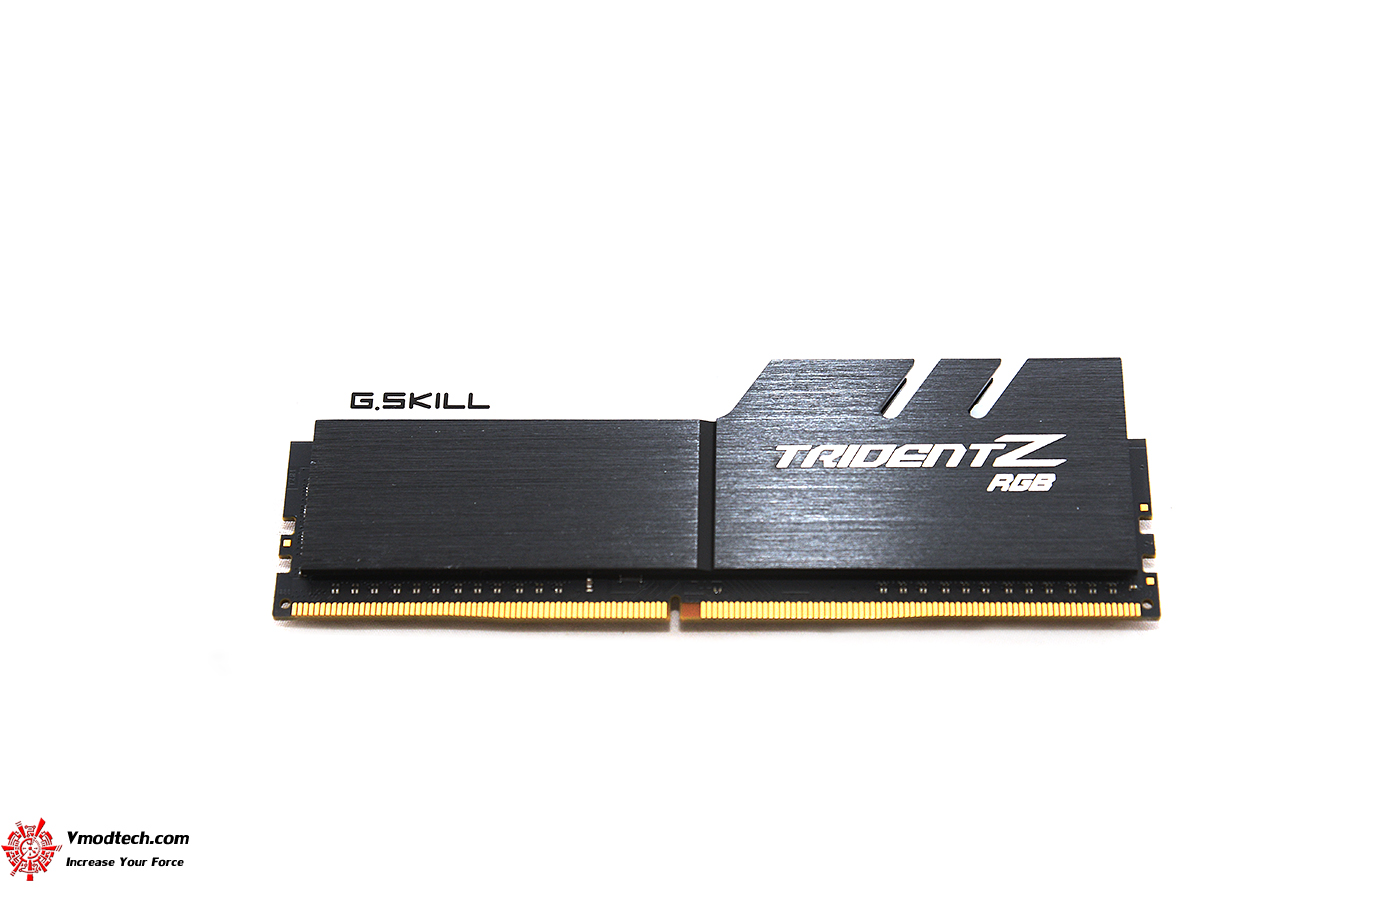 dsc 2924 G.SKILL Trident Z RGB DDR4 3200MHz 32GB (8GBx4) Quad Channel Review